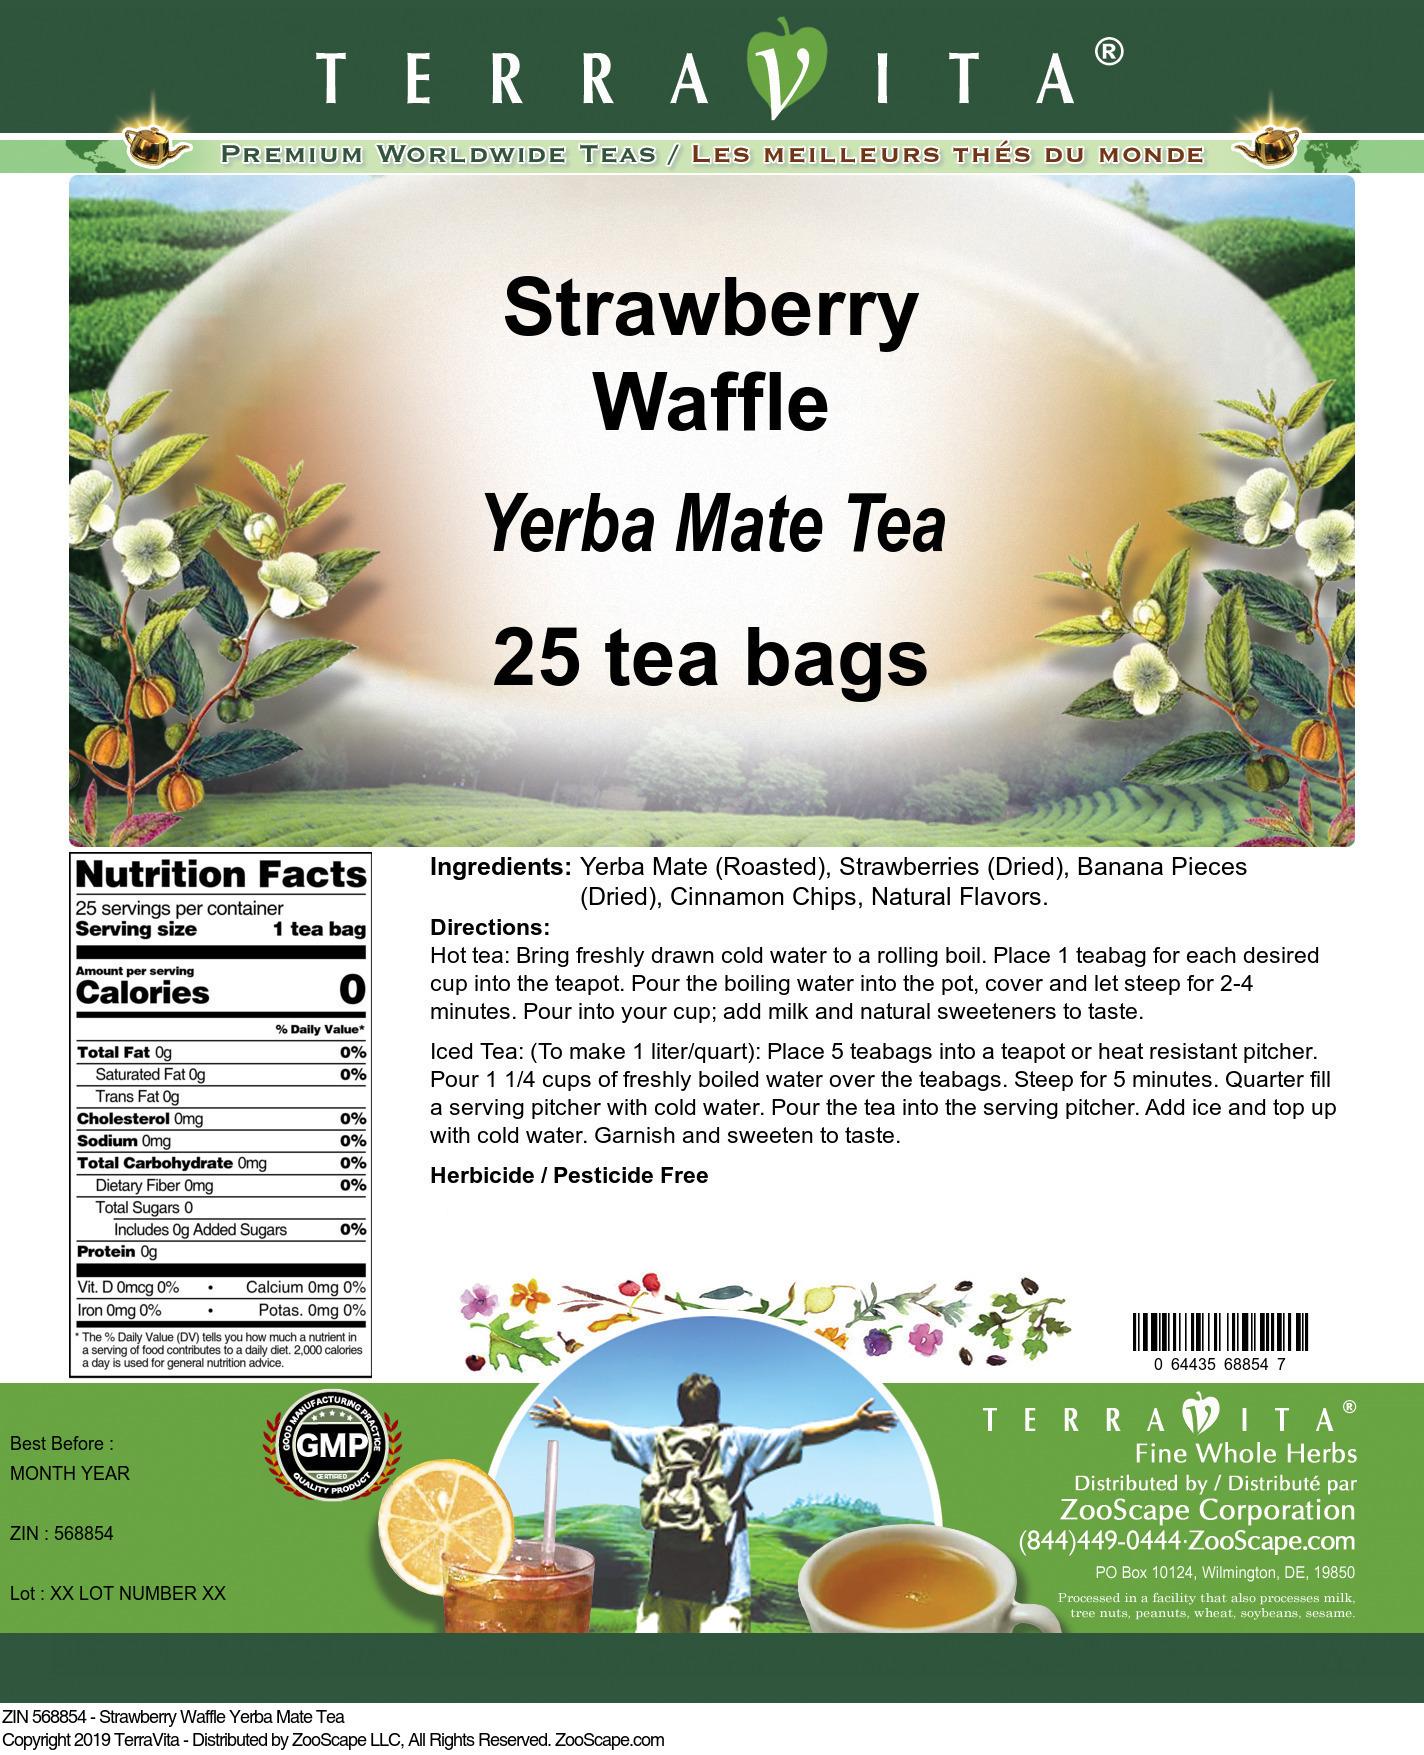 Strawberry Waffle Yerba Mate Tea